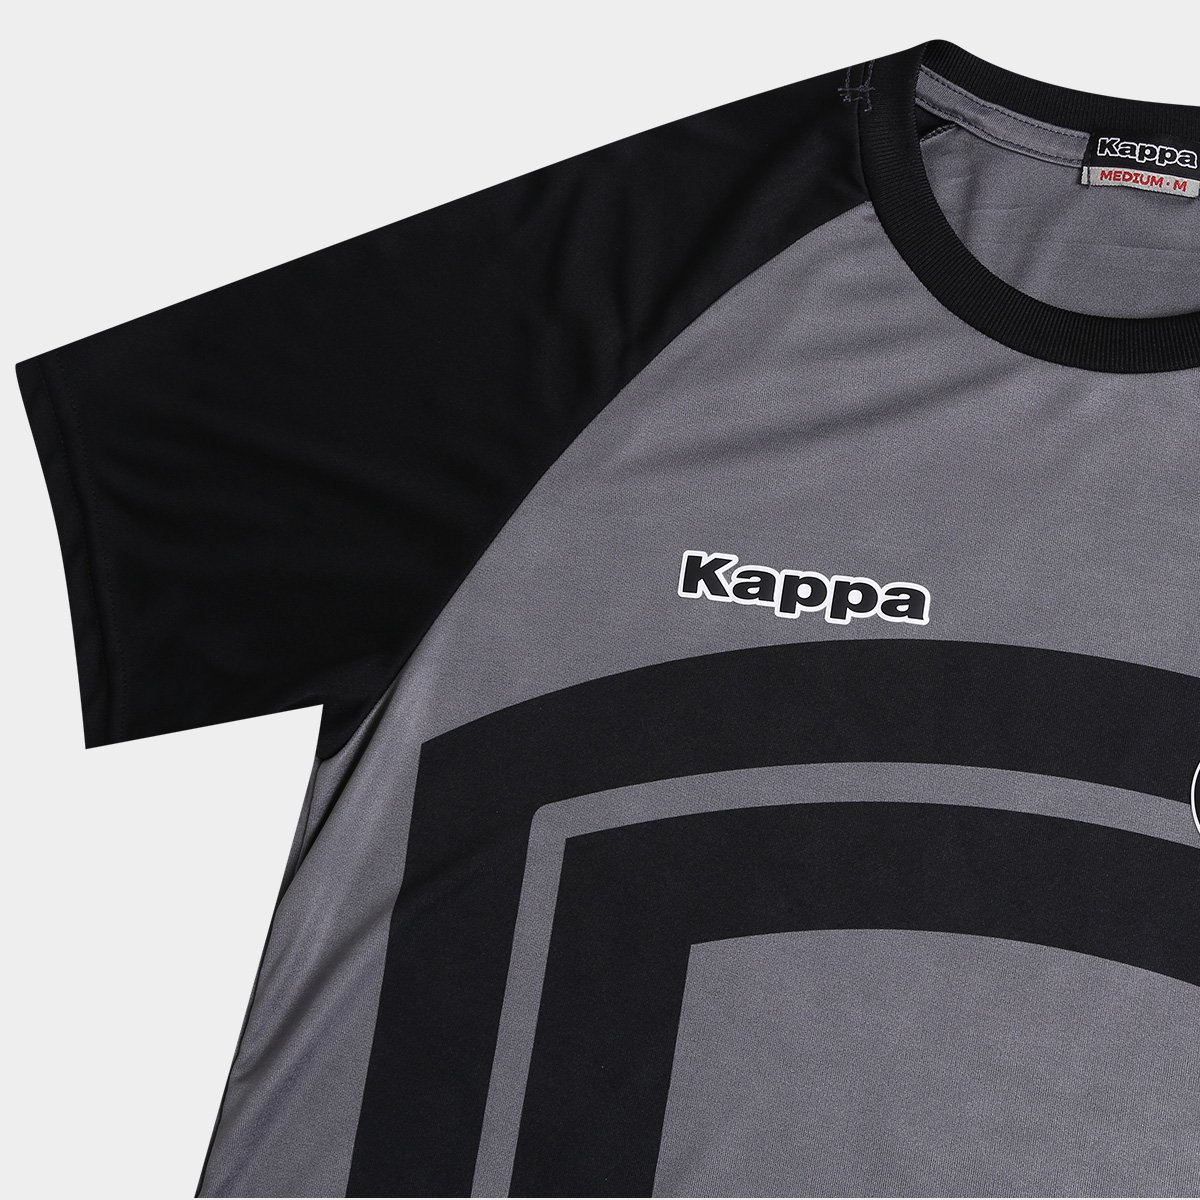 Camiseta Santos Lima 17 Masculina - Compre Agora  11c1eebd4d6a3